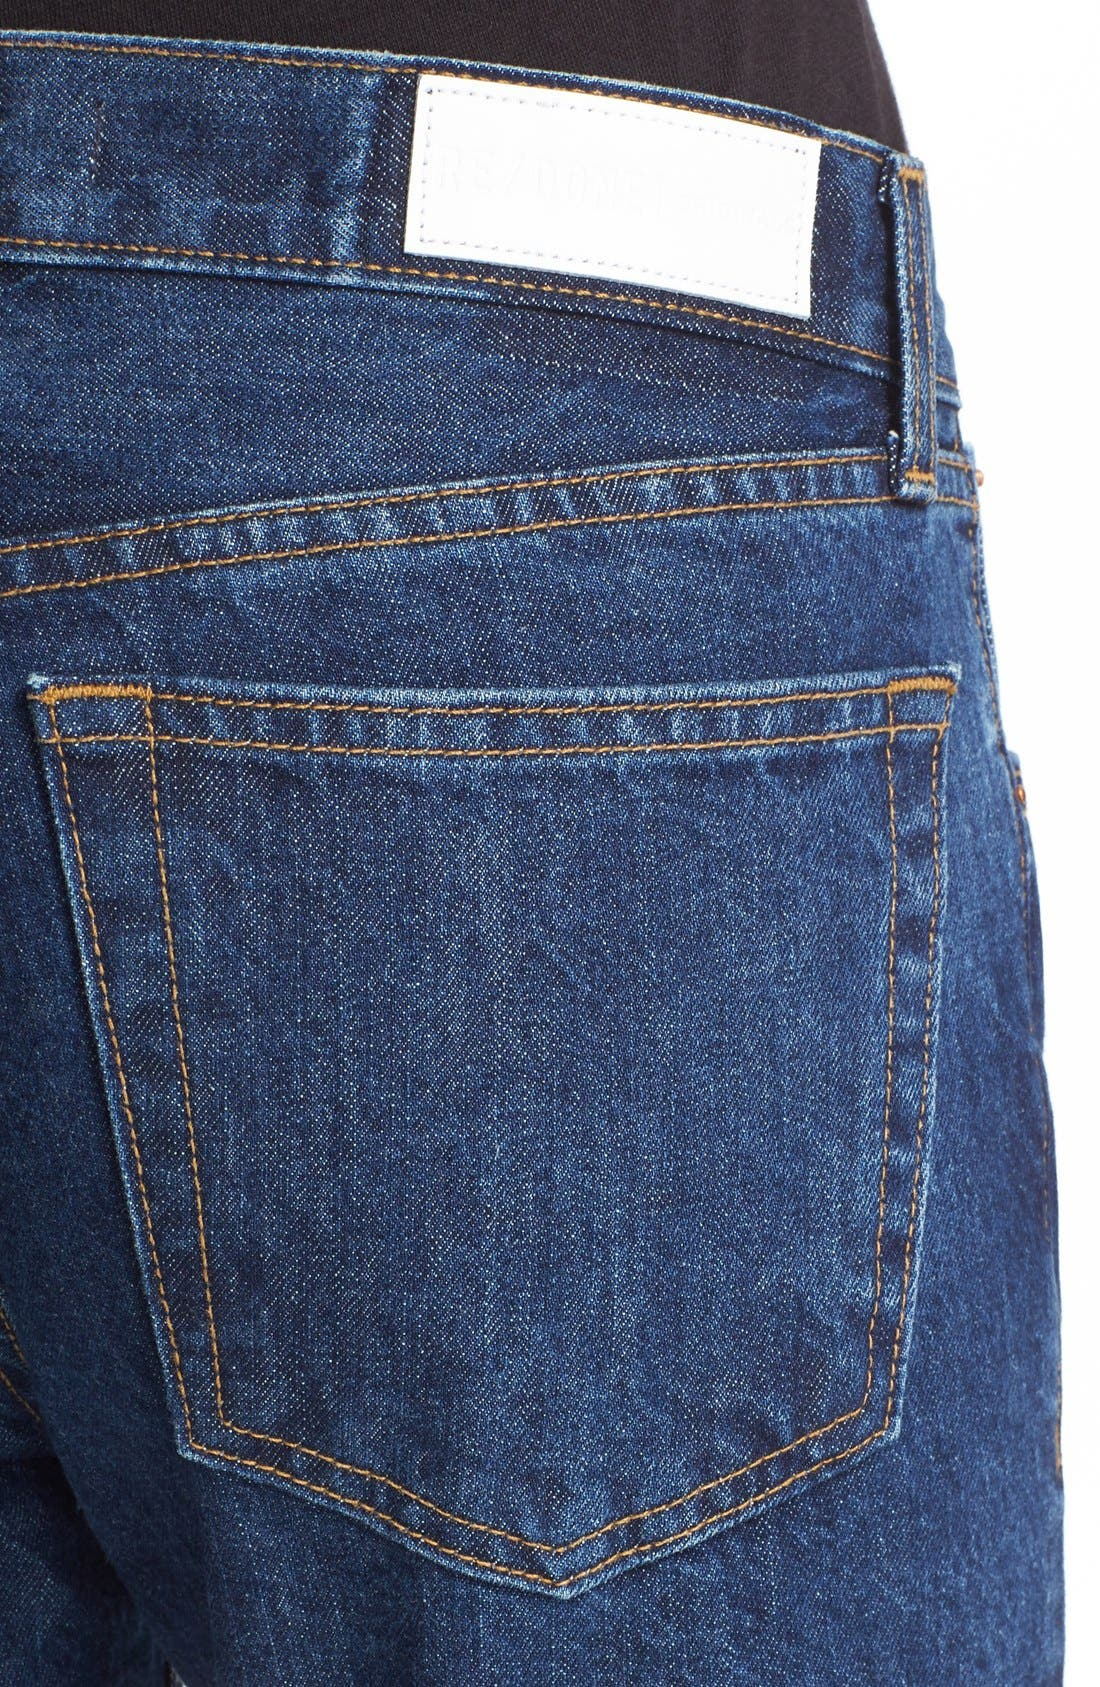 Originals High Waist Crop Jeans,                             Alternate thumbnail 4, color,                             400